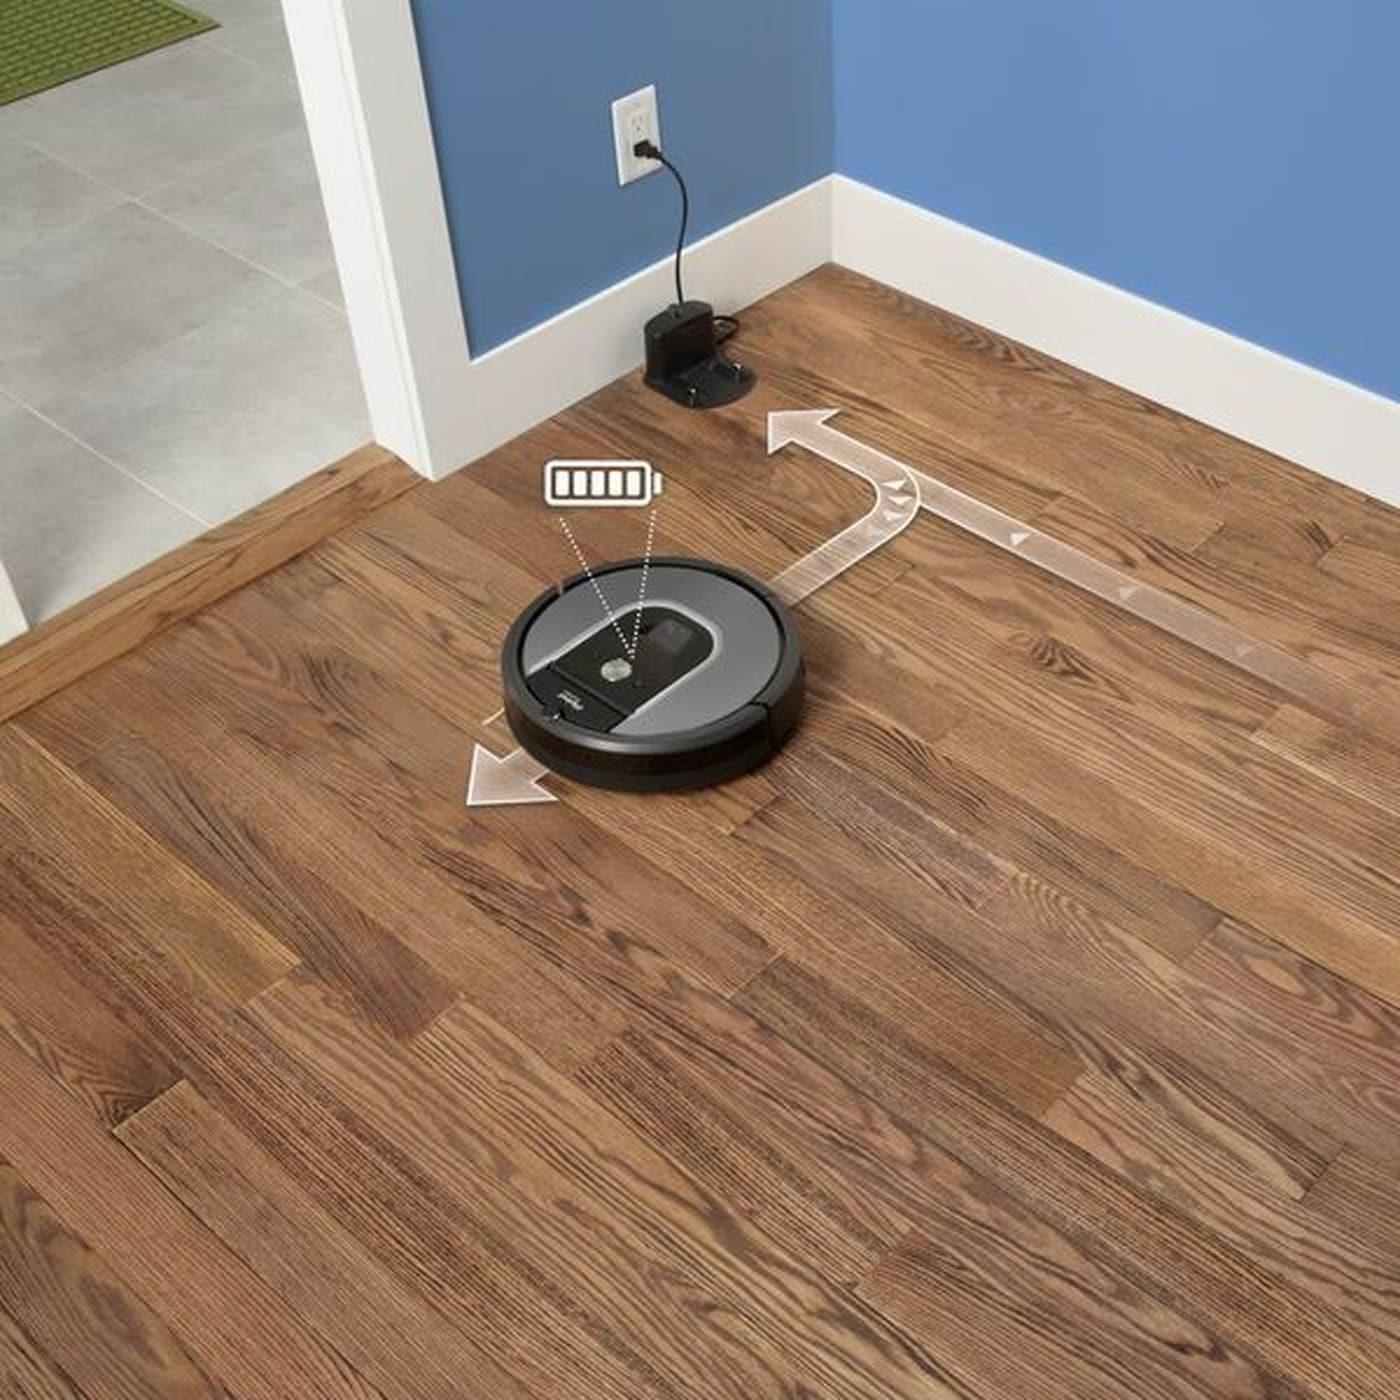 robot aspirateur Roomba 960 d'iRobot